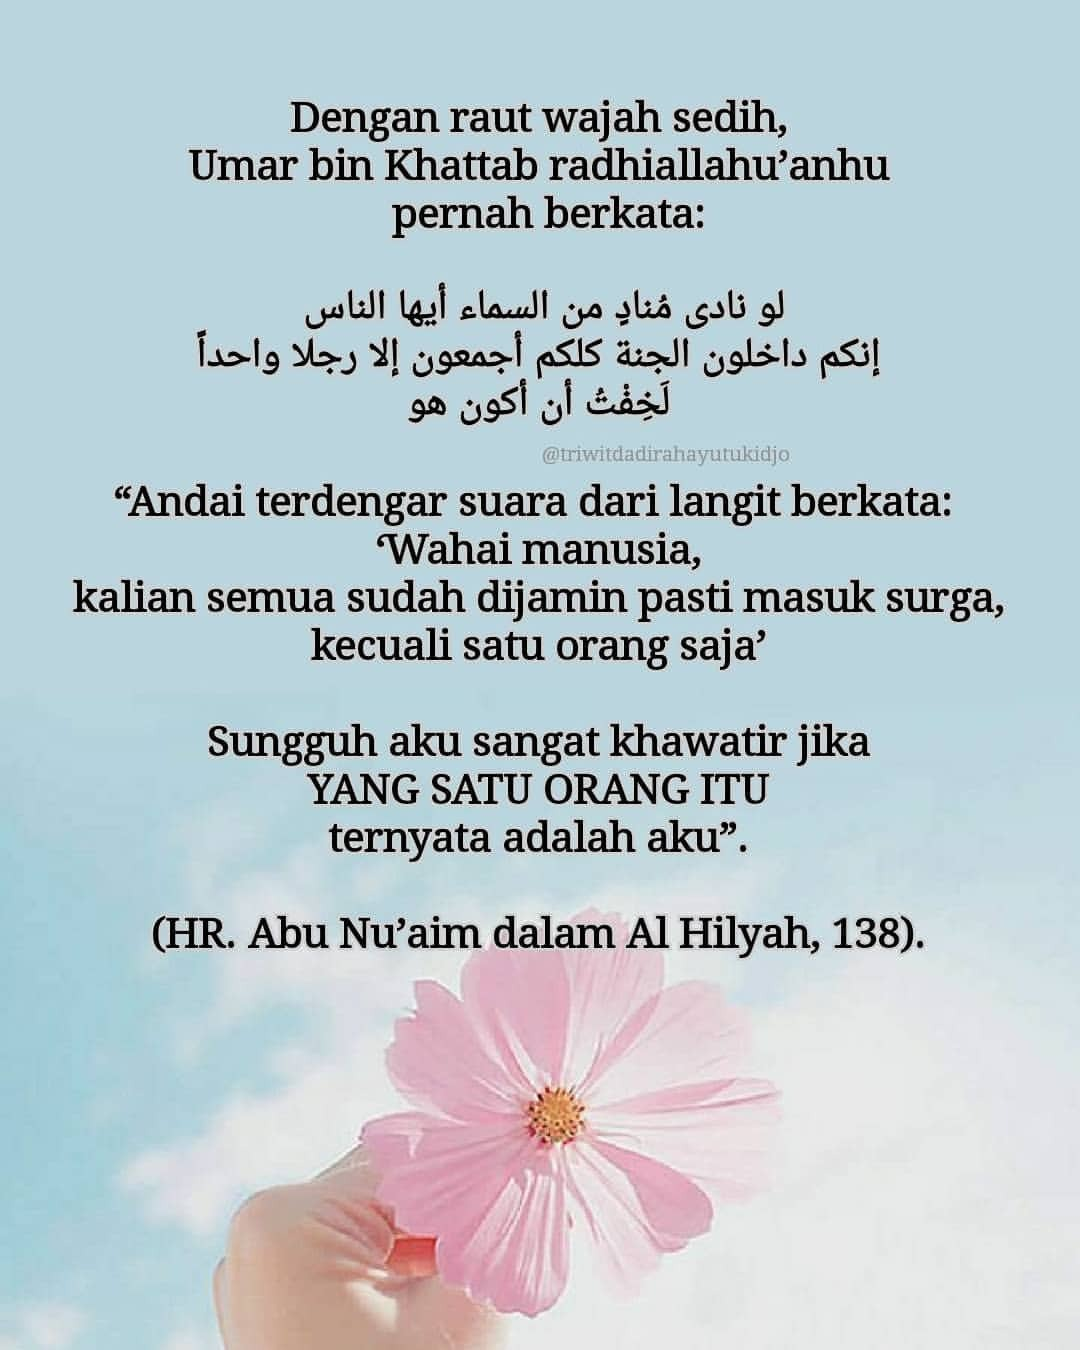 Tulisan Barakallah Fii Umrik Yang Benar : tulisan, barakallah, umrik, benar, Rahayu, Tukidjo